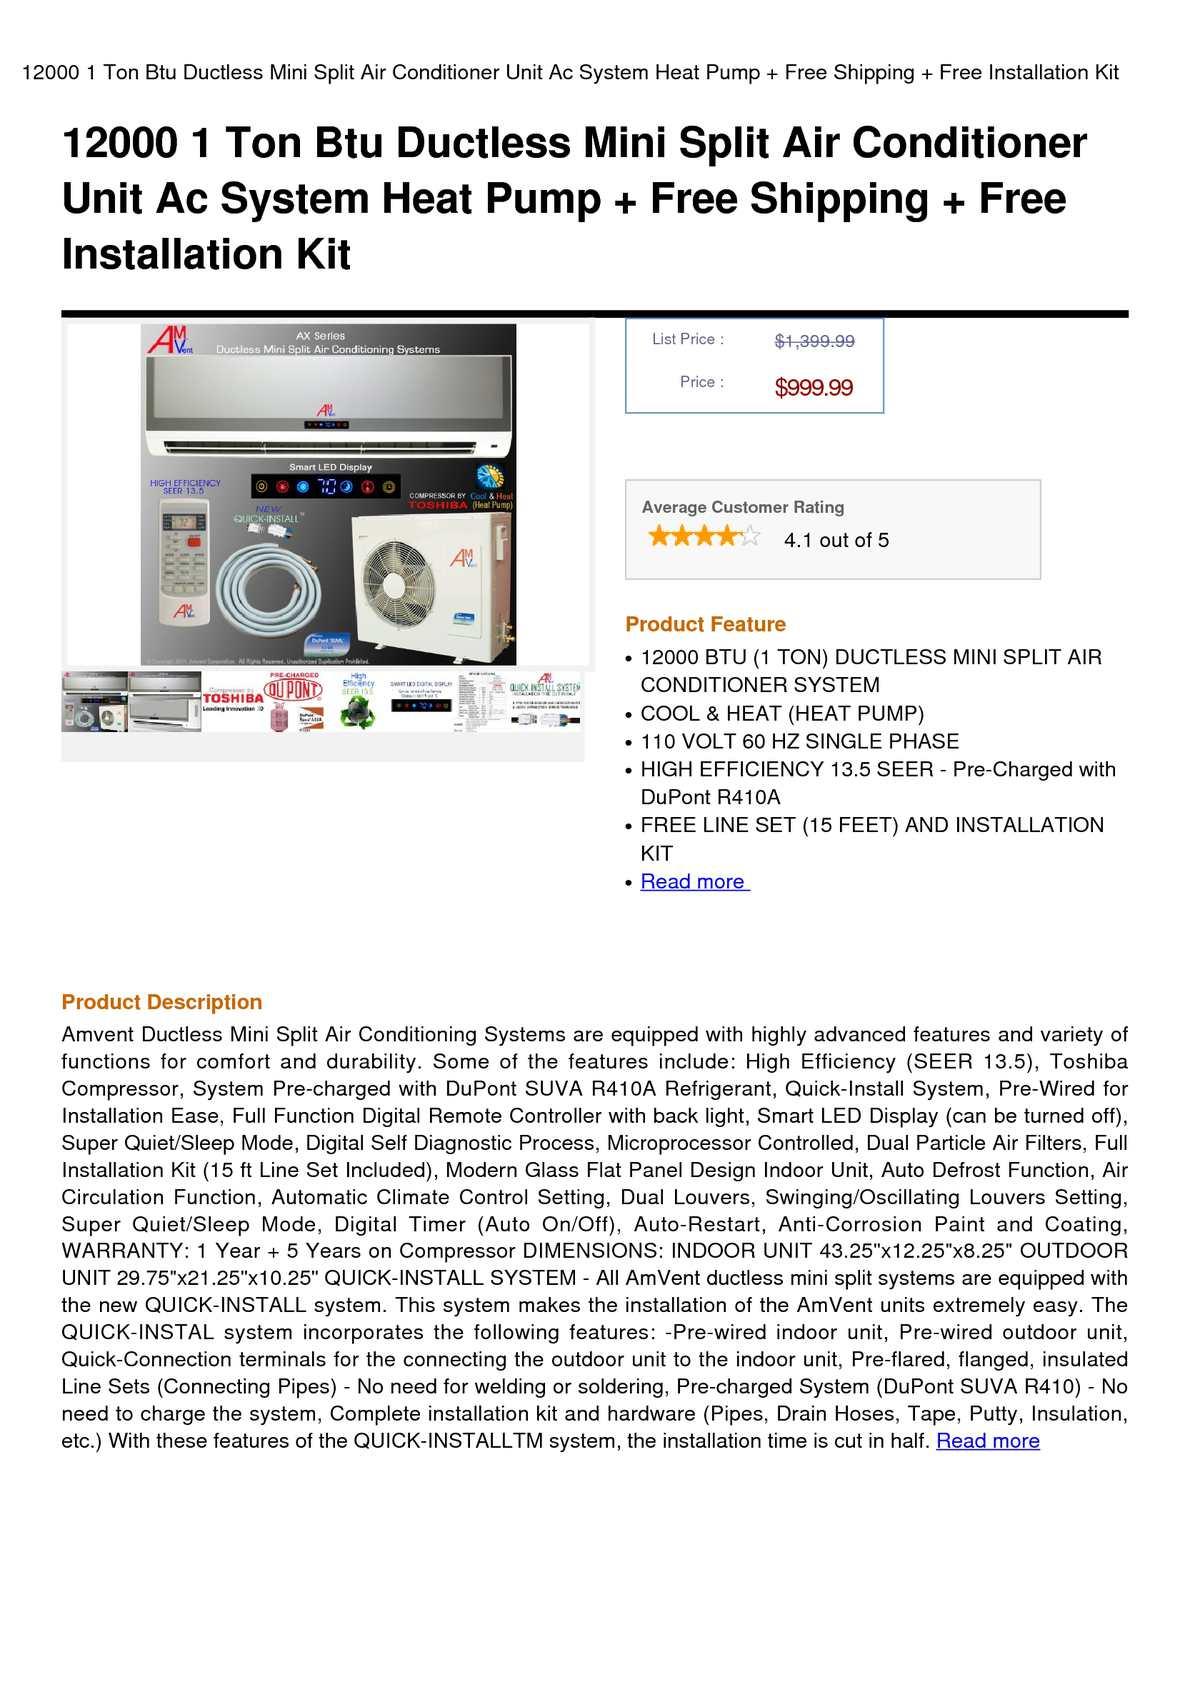 Calamo 12000 1 Ton Btu Ductless Mini Split Air Conditioner Unit Con Wiring Diagram Ac System Heat Pump Free Shipping Installation Kit